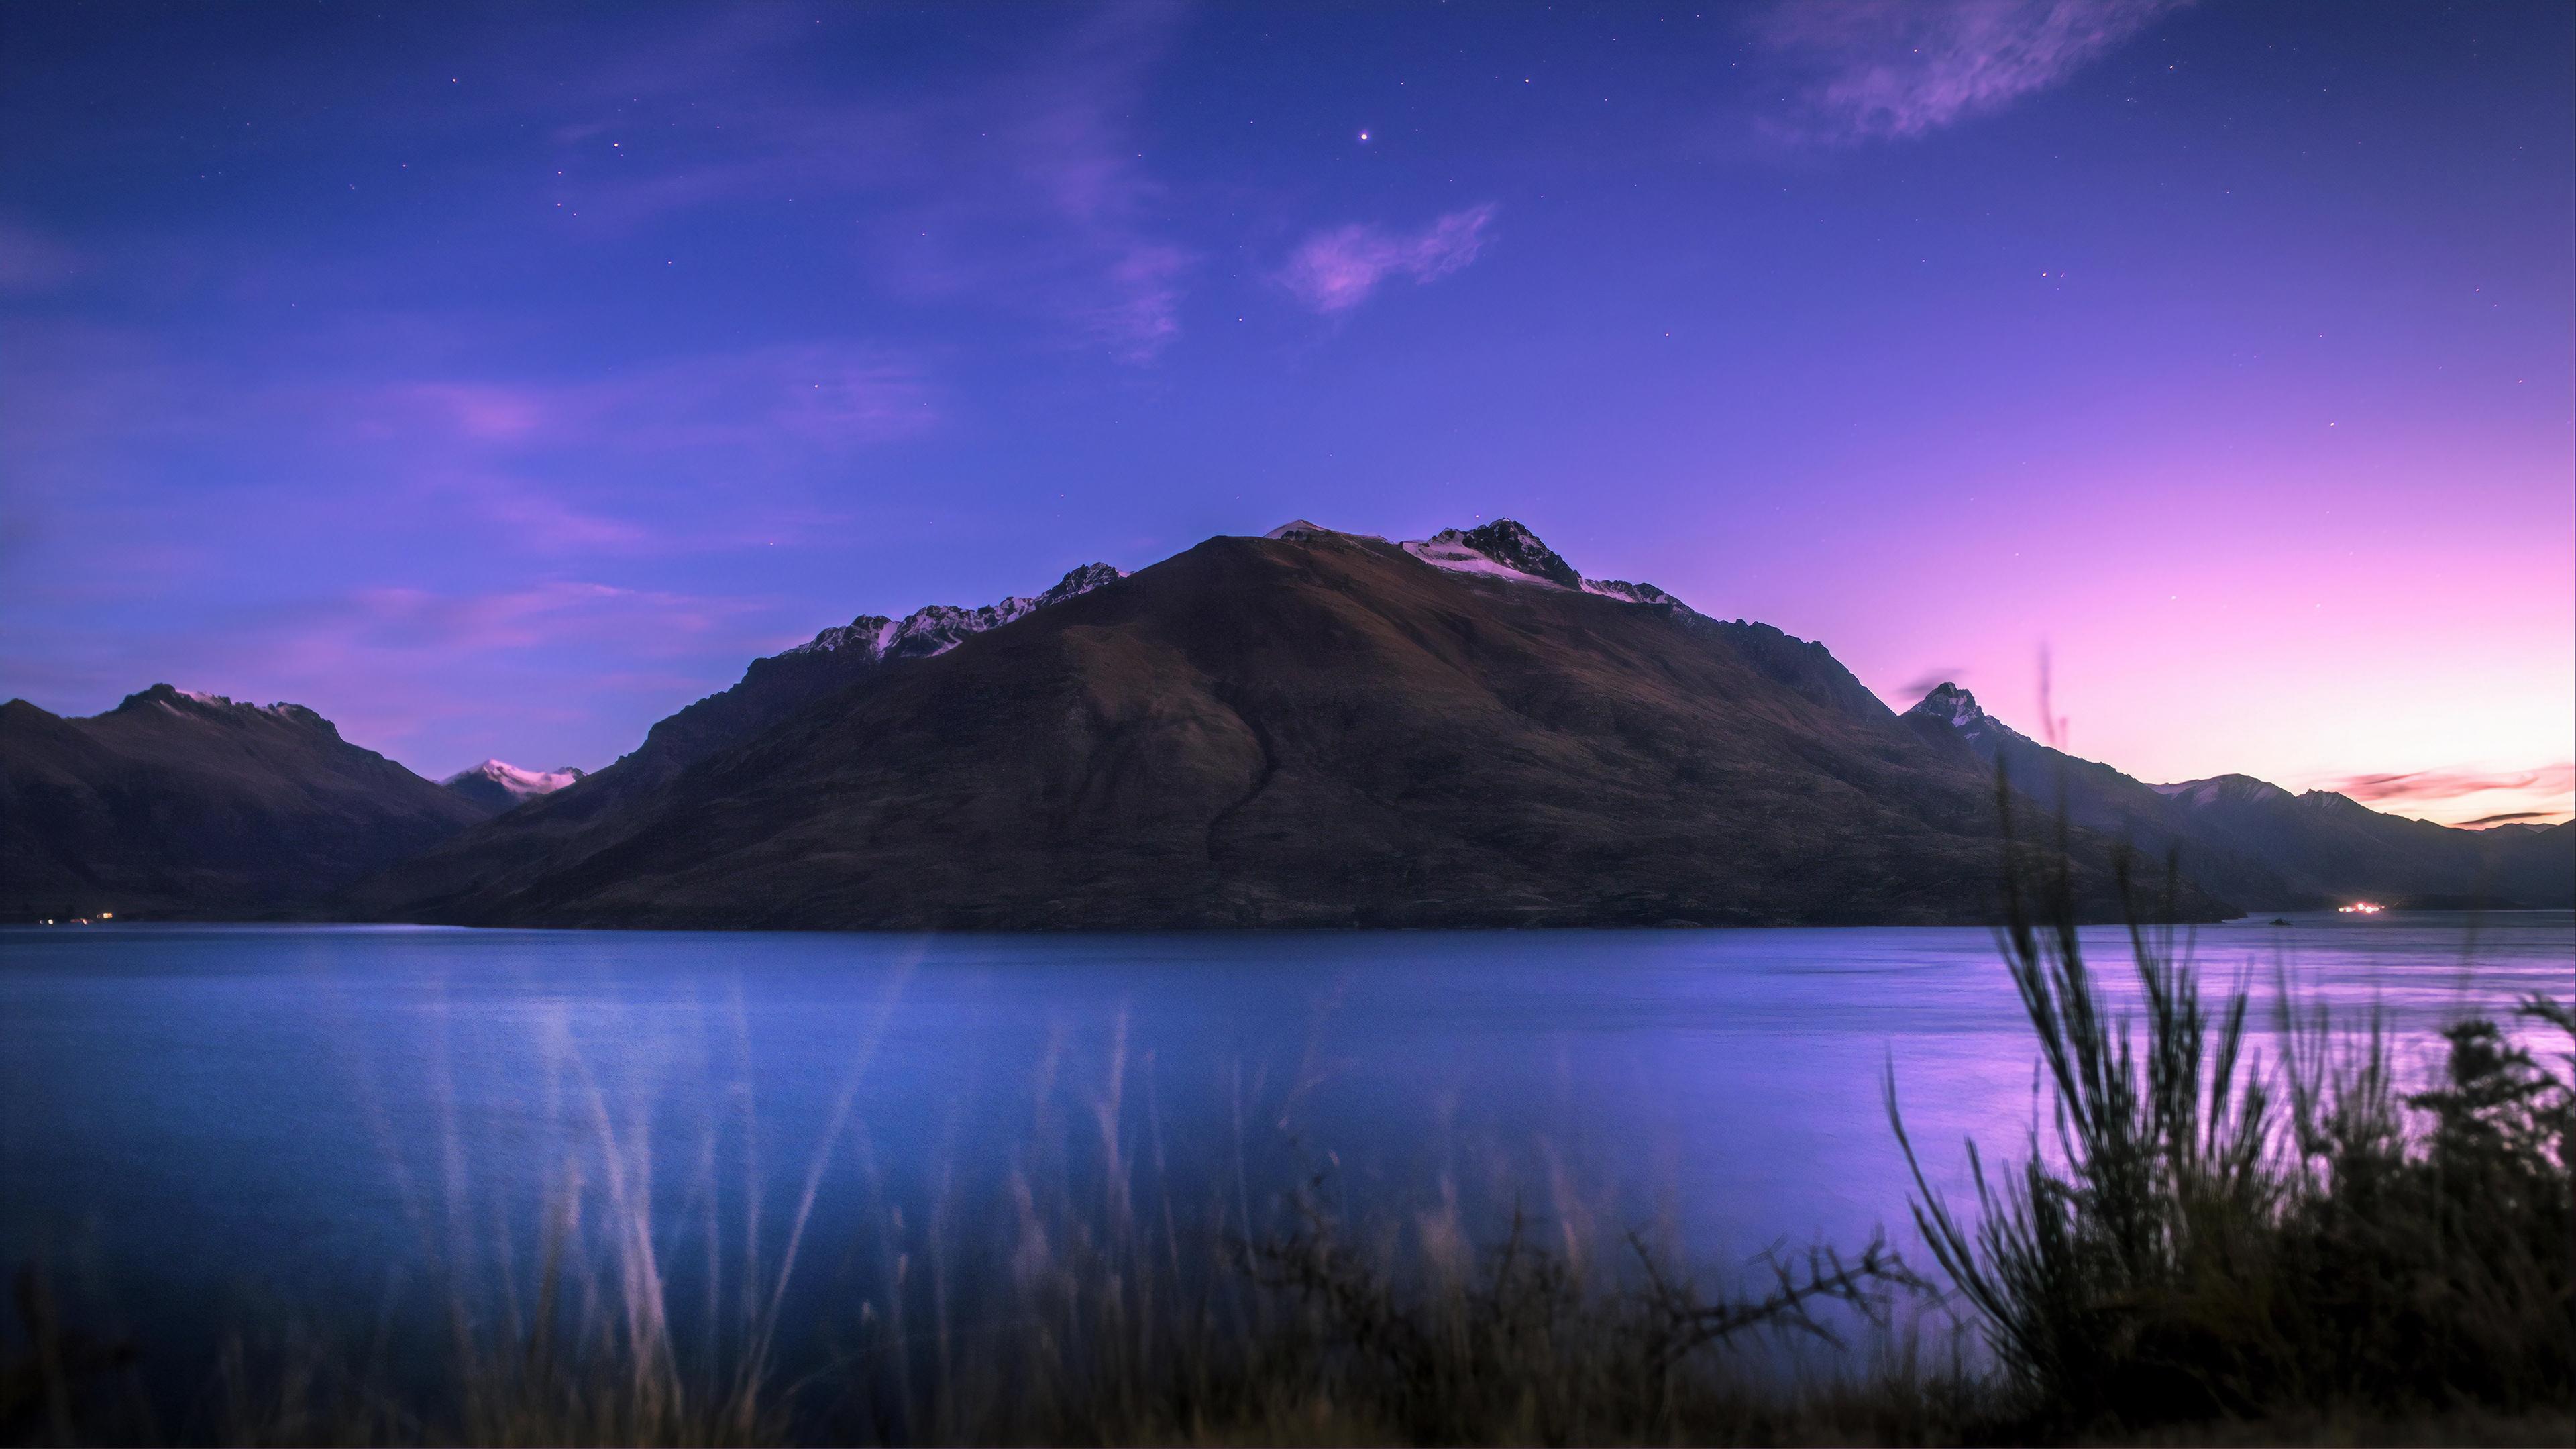 Wallpaper 4k Lake Wakatipu In Newzealand 4k Wallpapers Hd